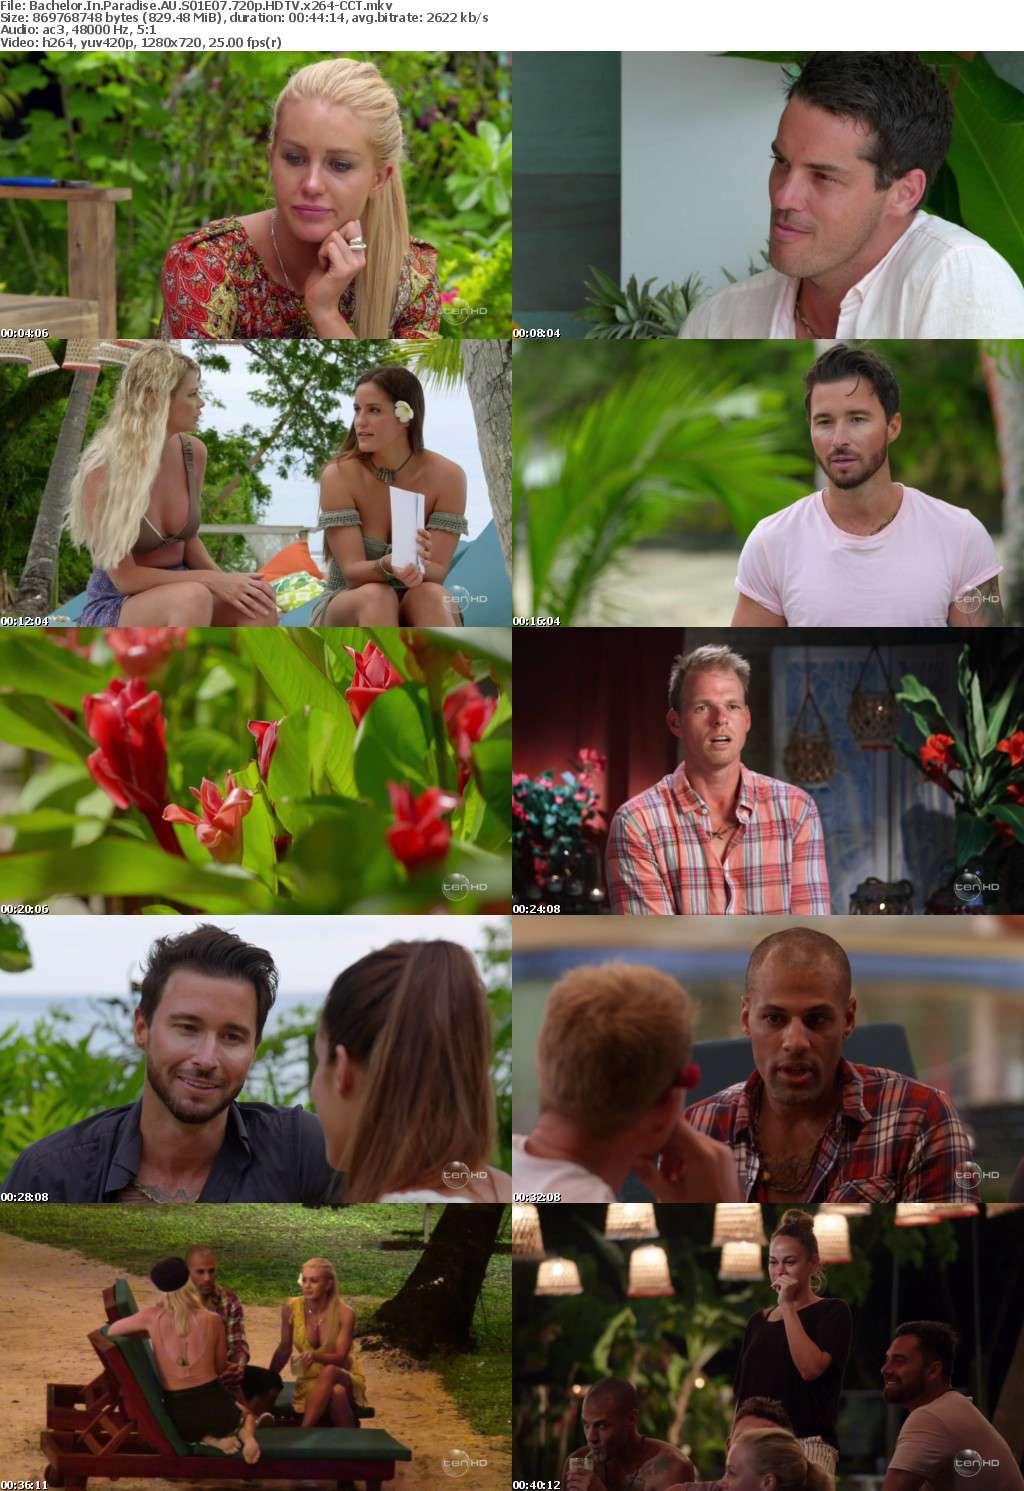 Bachelor In Paradise AU S01E07 720p HDTV x264-CCT